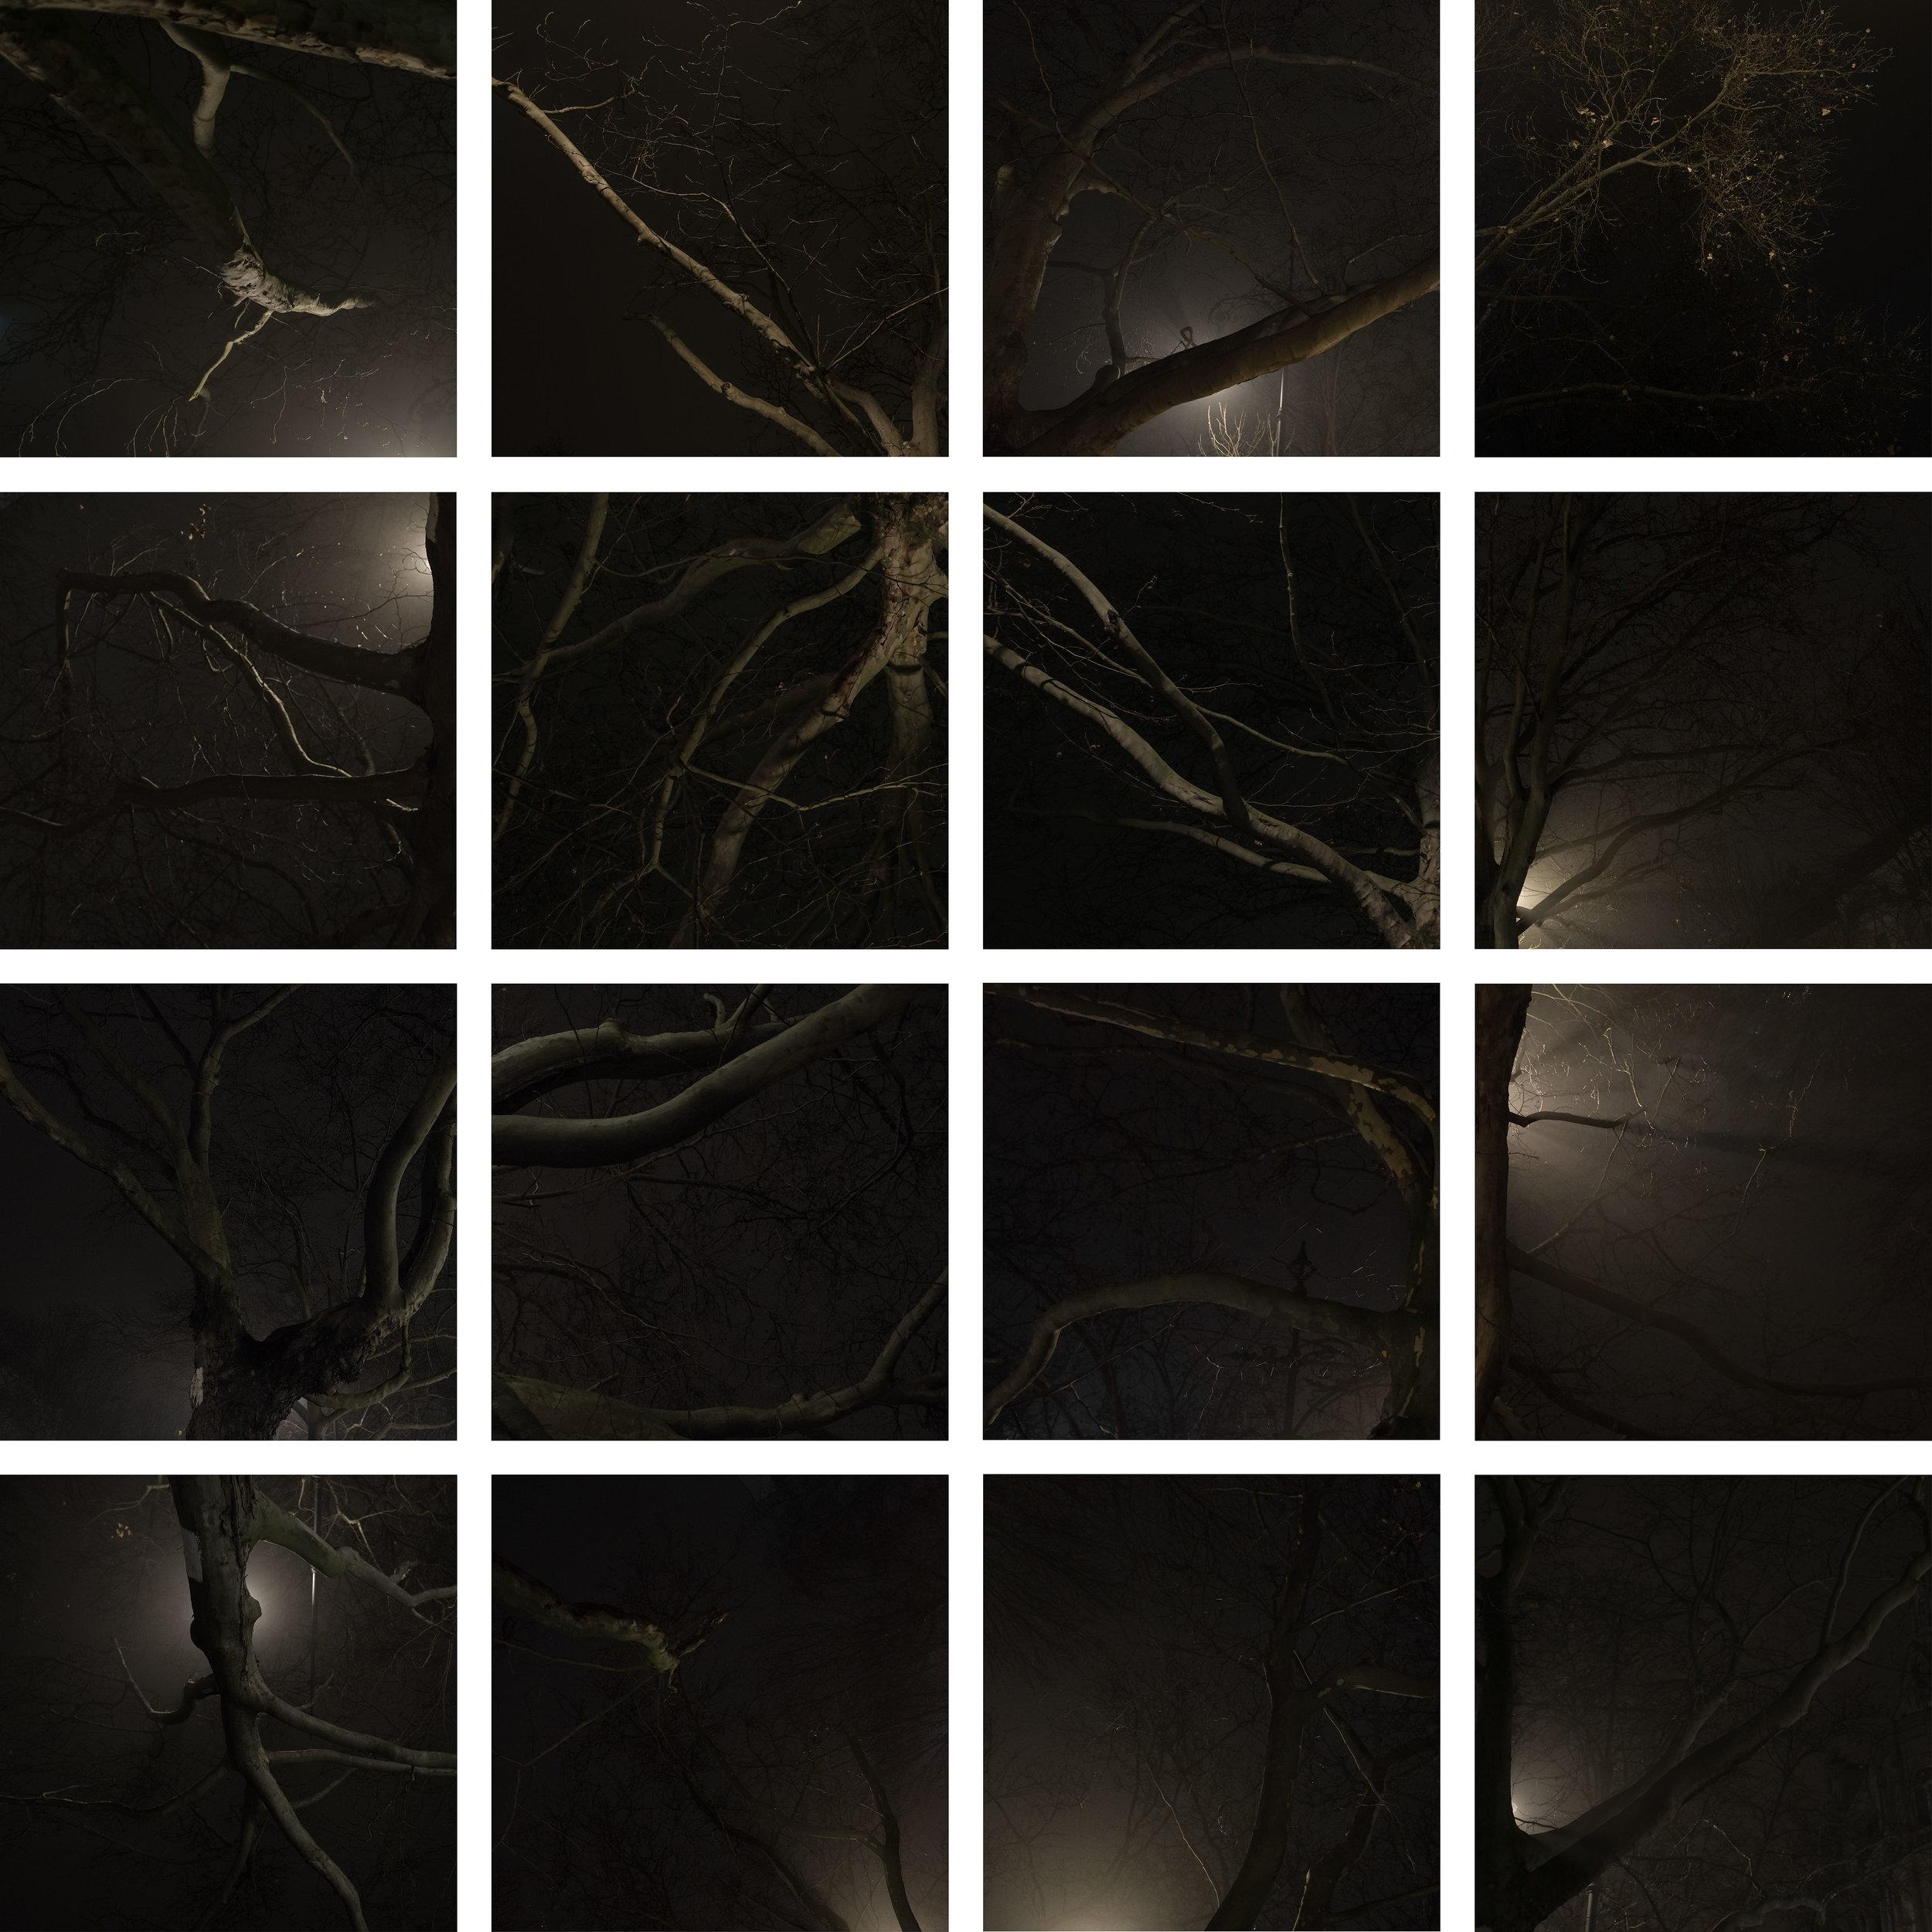 Limbs_2_k.jpg